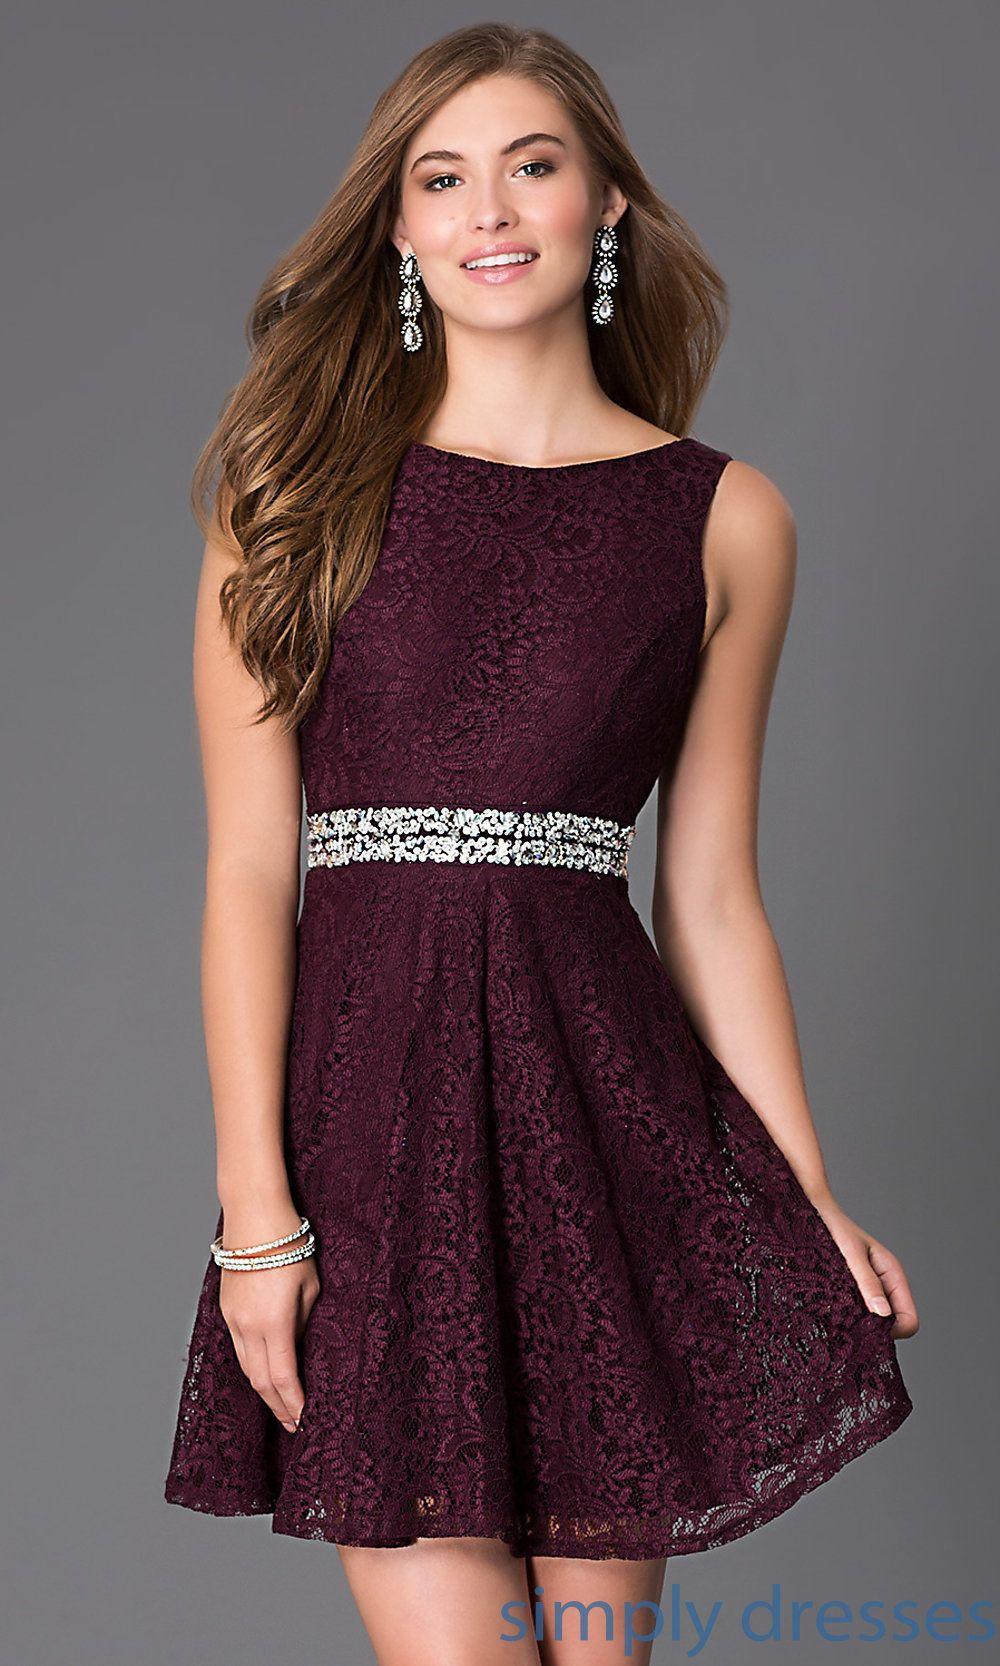 Short Sleeveless Lace Dress D8H8 by Speechless  Short